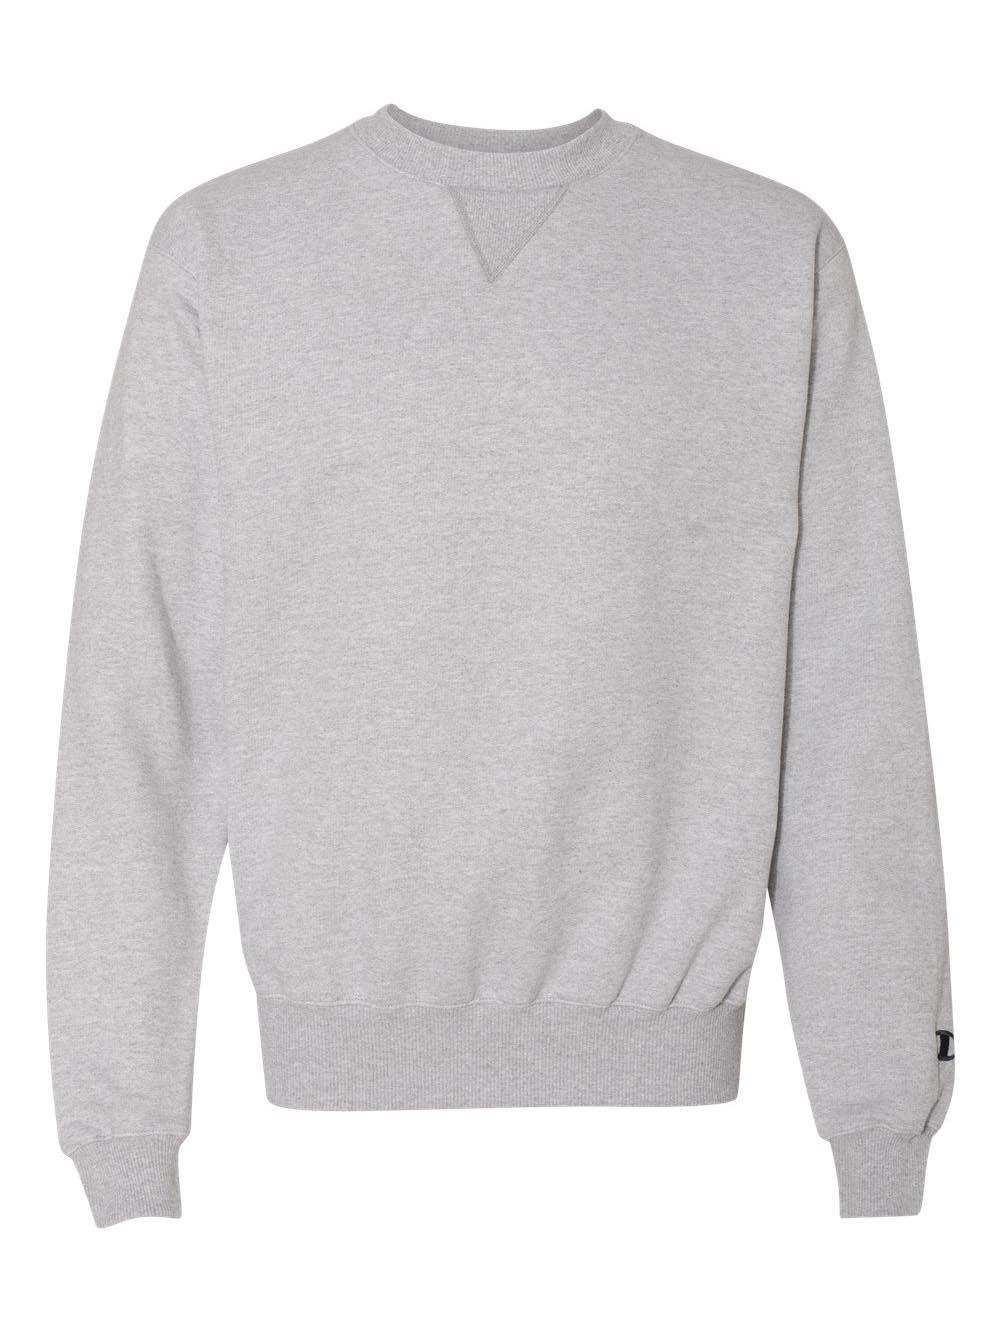 Champion Men's Max Crewneck Full Athletic Fit Sweatshirt, silver gray, Medium